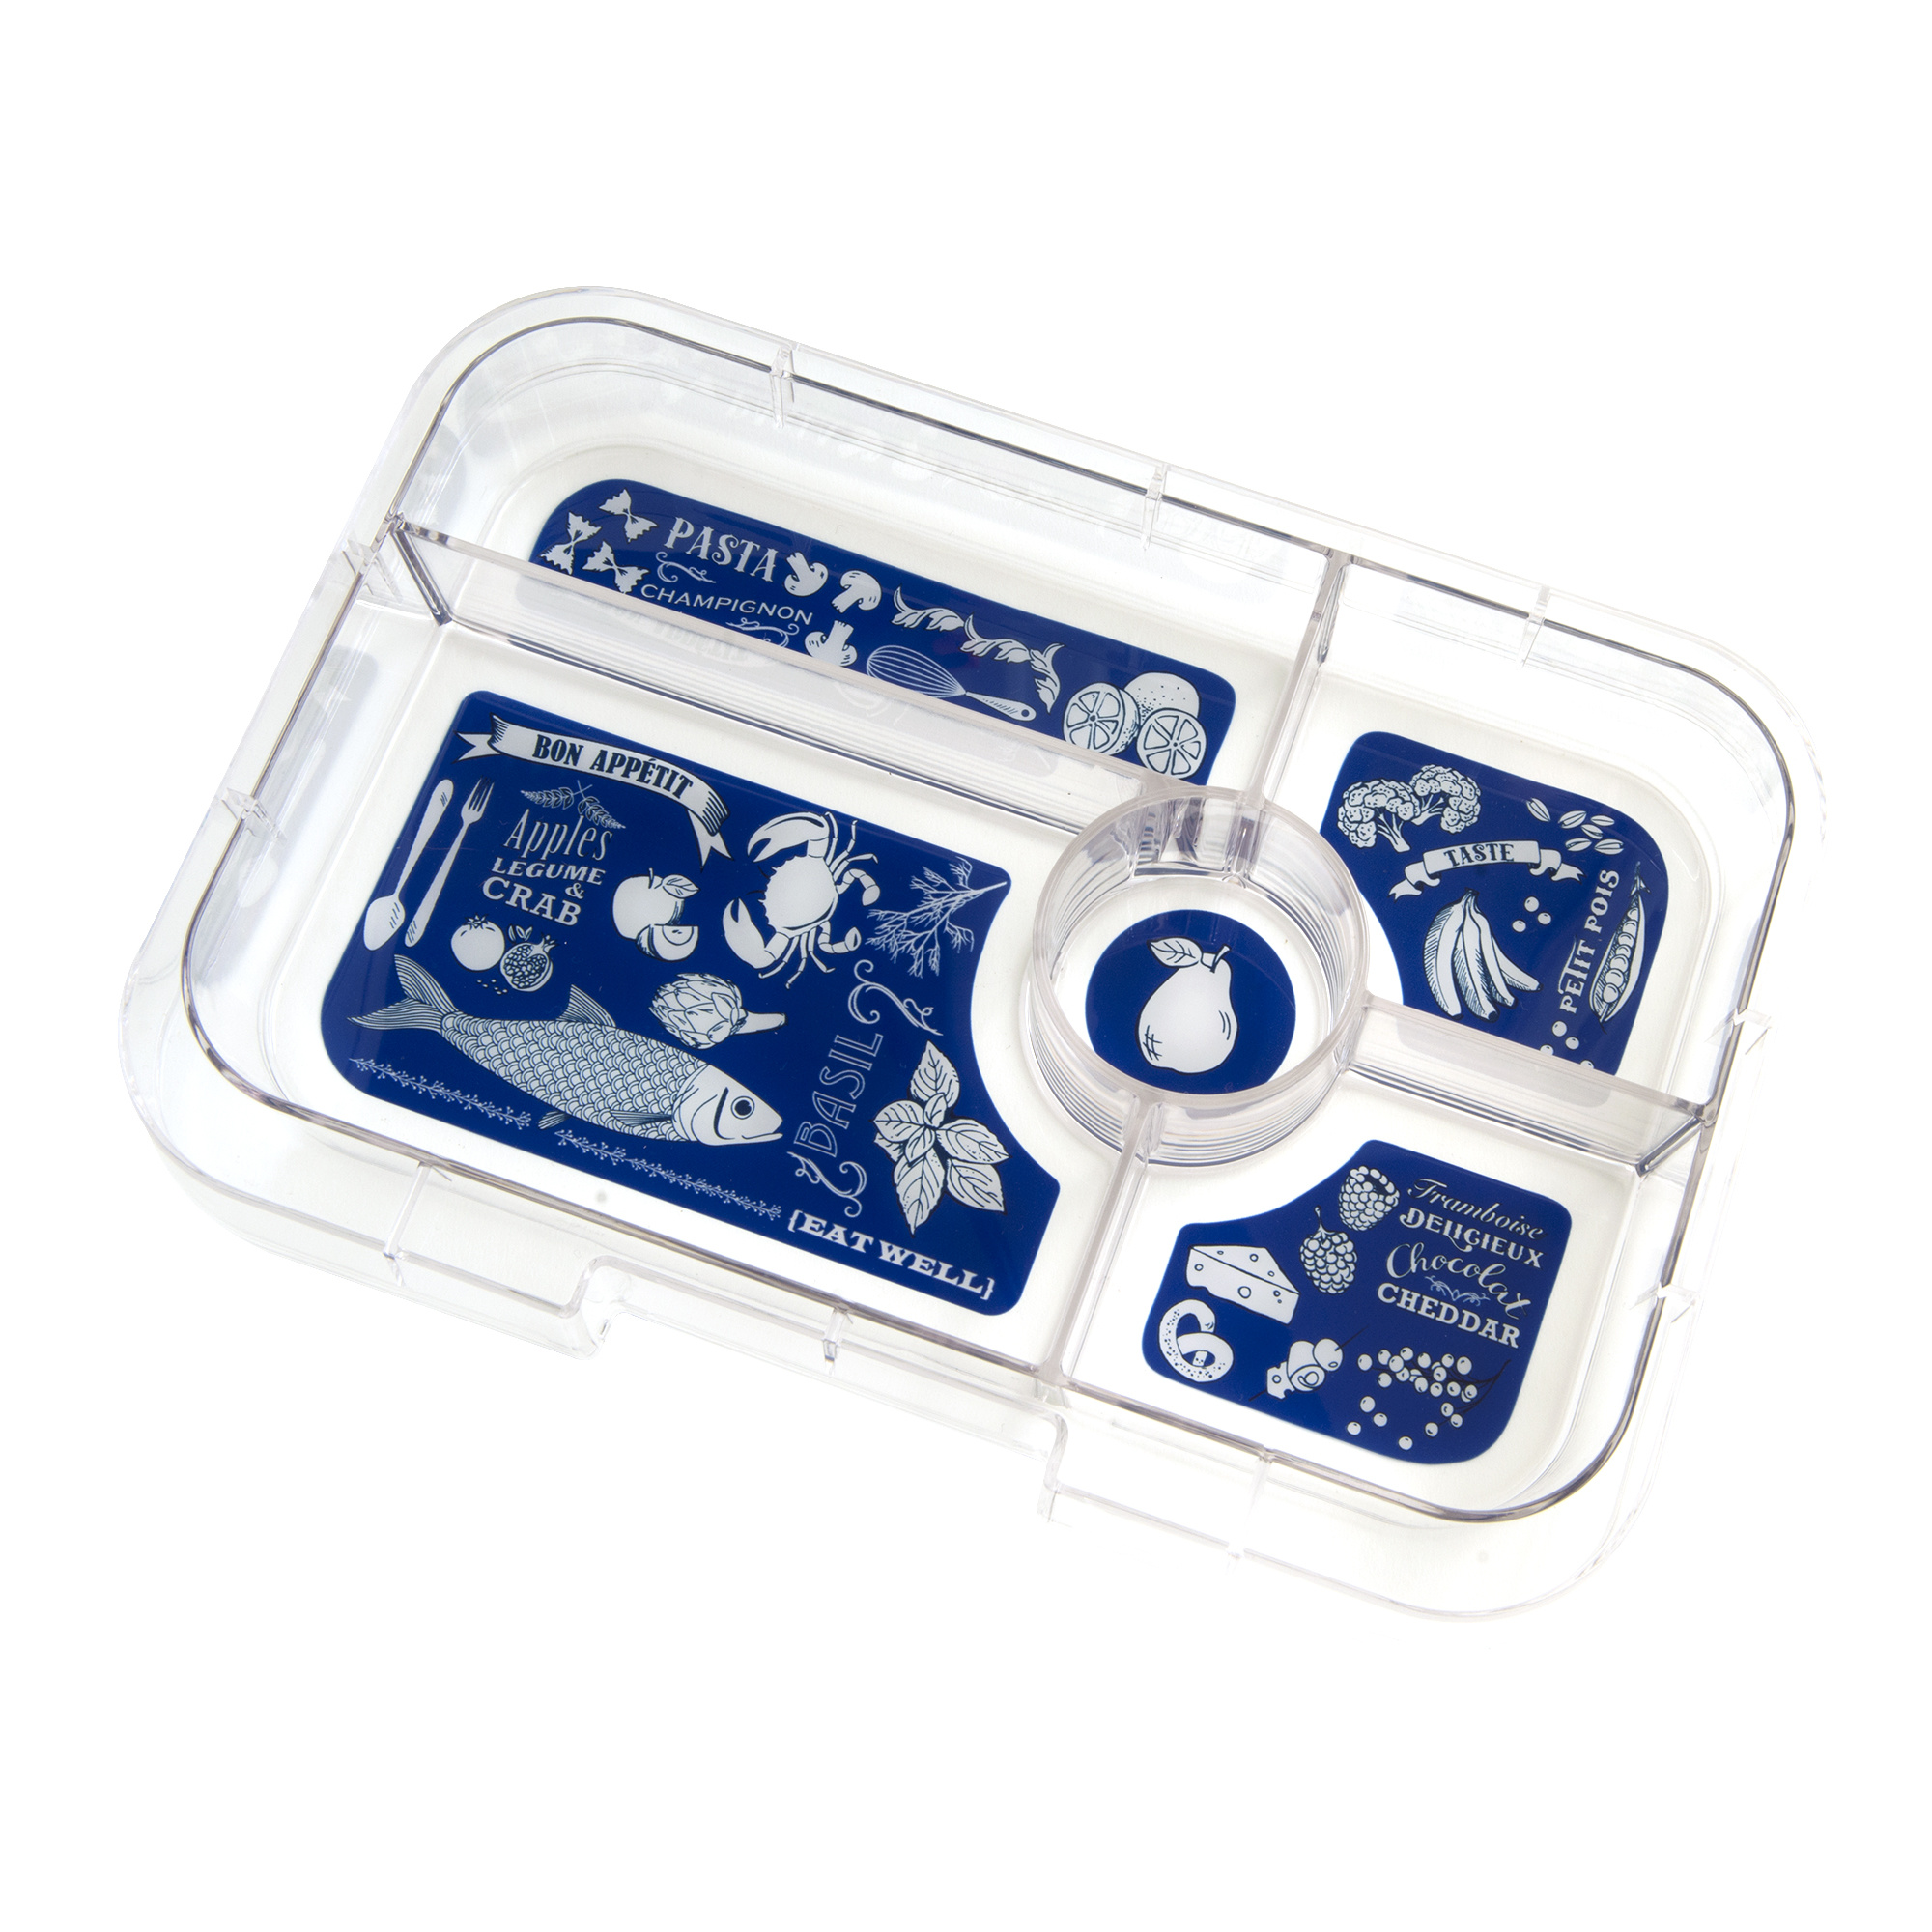 Yumbox Tapas XL 5-sections Portofino blue / Bon appetit tray-4